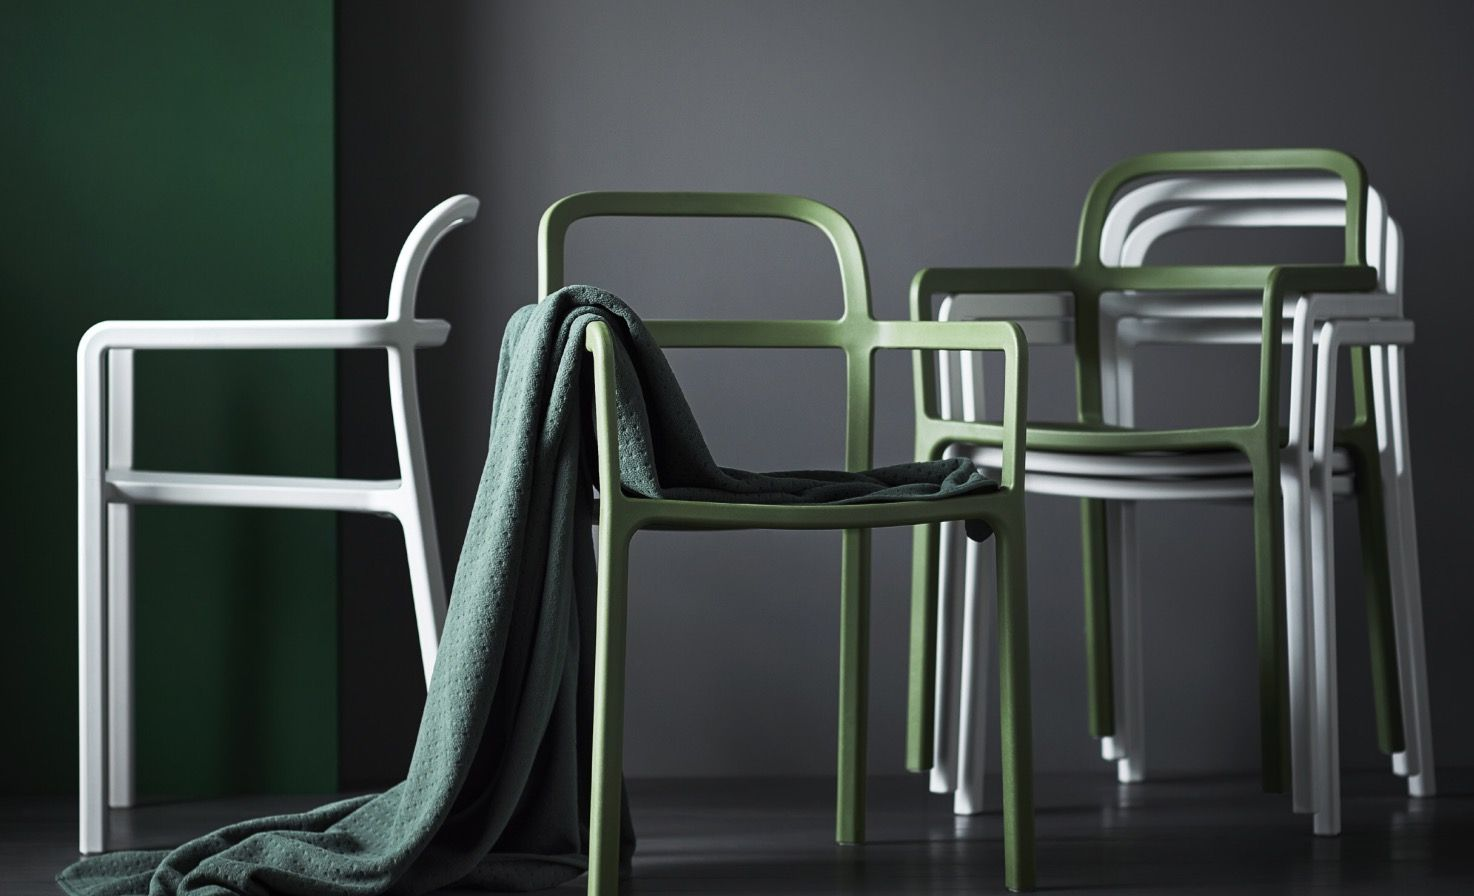 Ikea x hay ypperlig chair £40 design ikea x hay ikea ypperlig